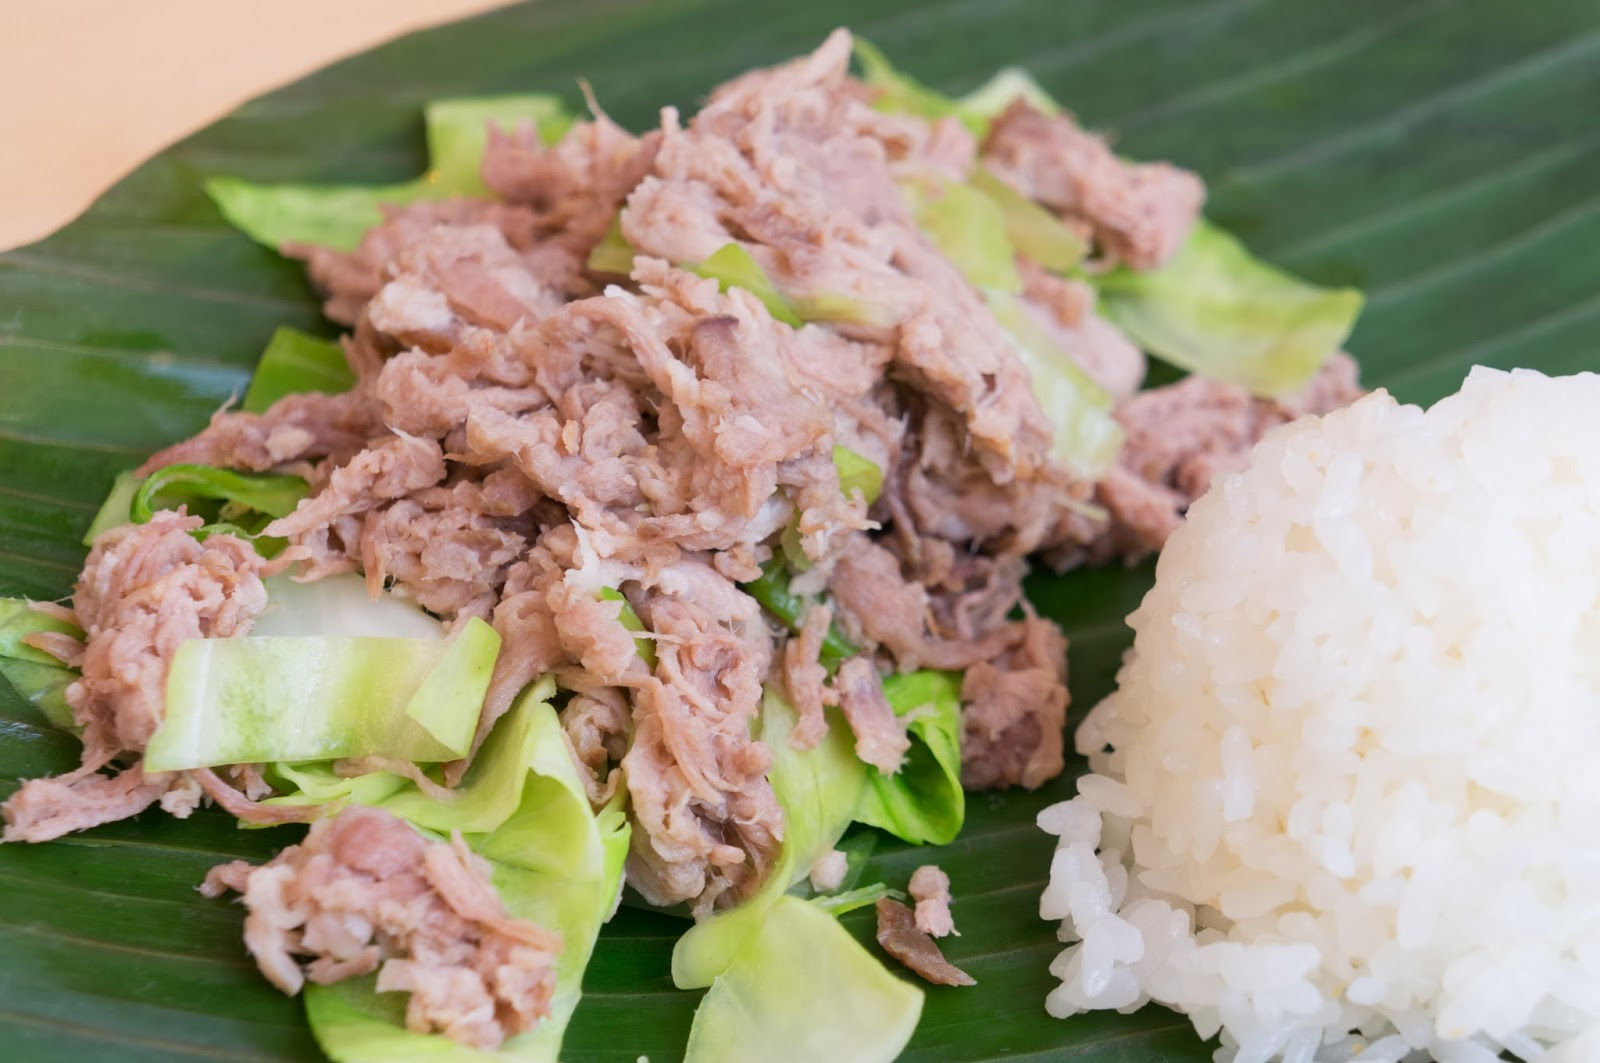 Kalua pork in the oven recipe